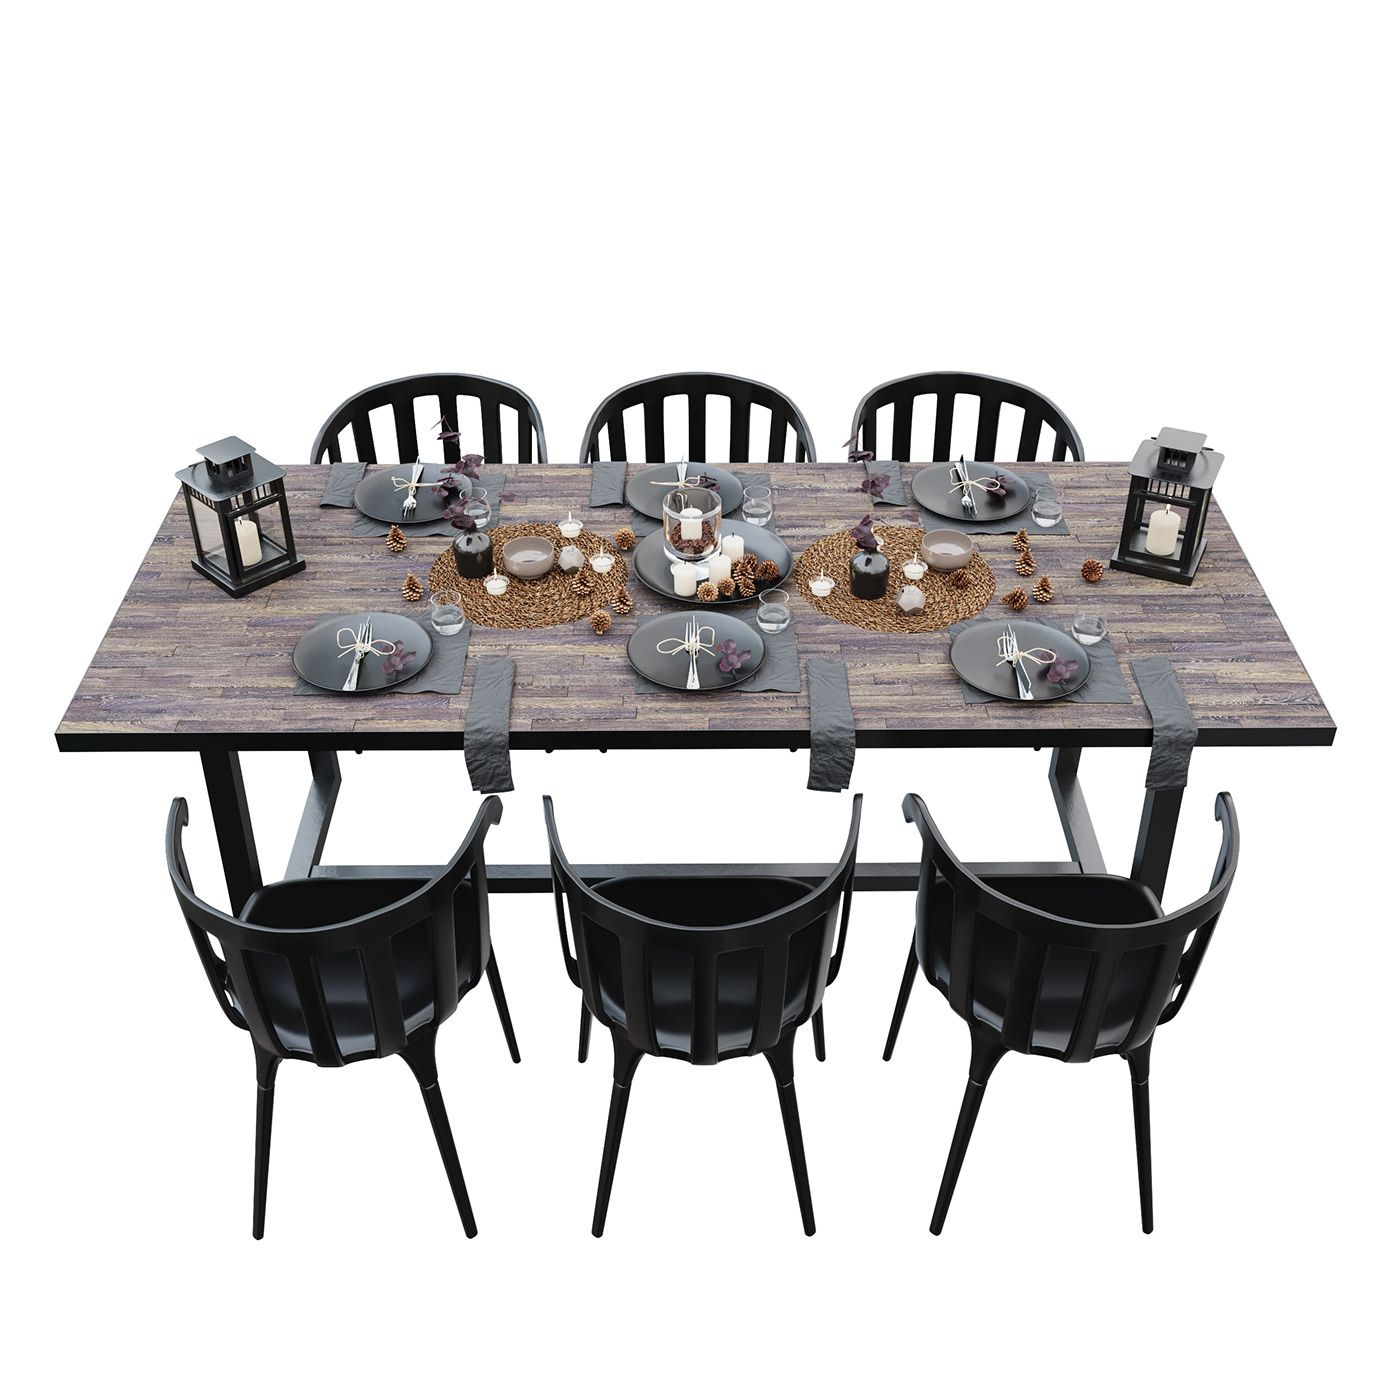 Download Free 3d Model Ikea Black Set From Vasyl Kuchabskyy